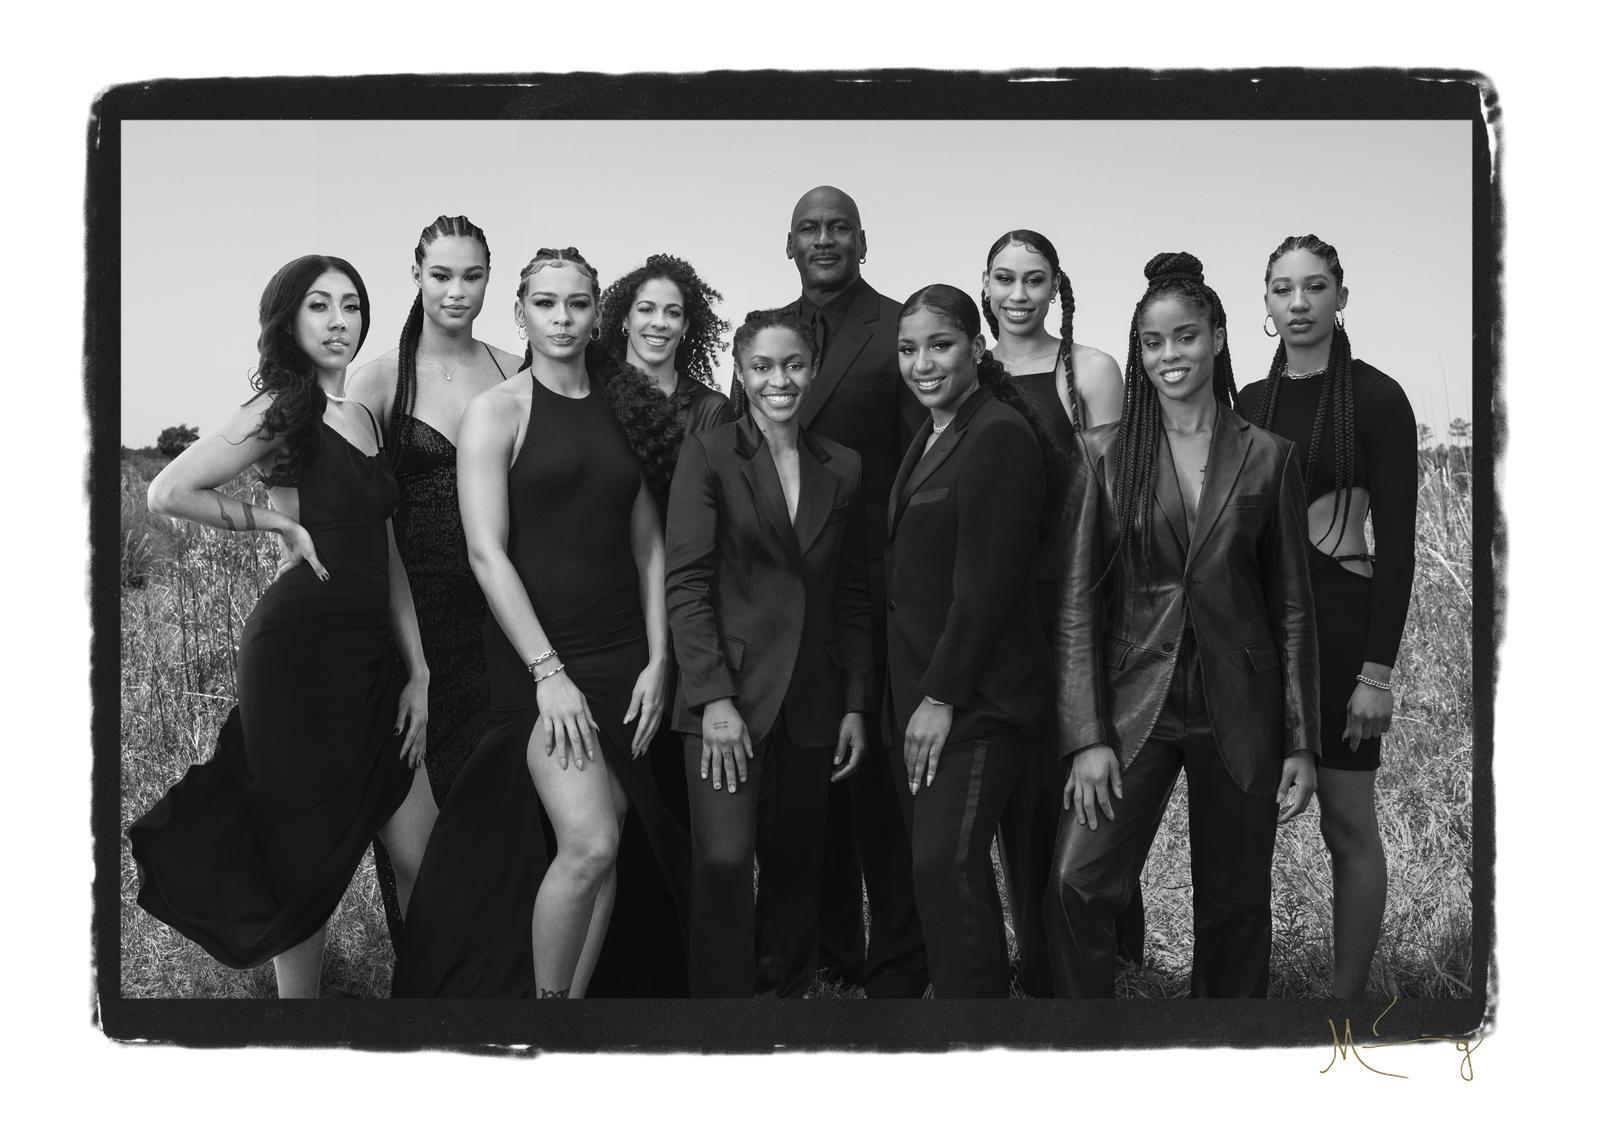 Jordan Brand Announces Partnership With 11 Emerging WNBA Players